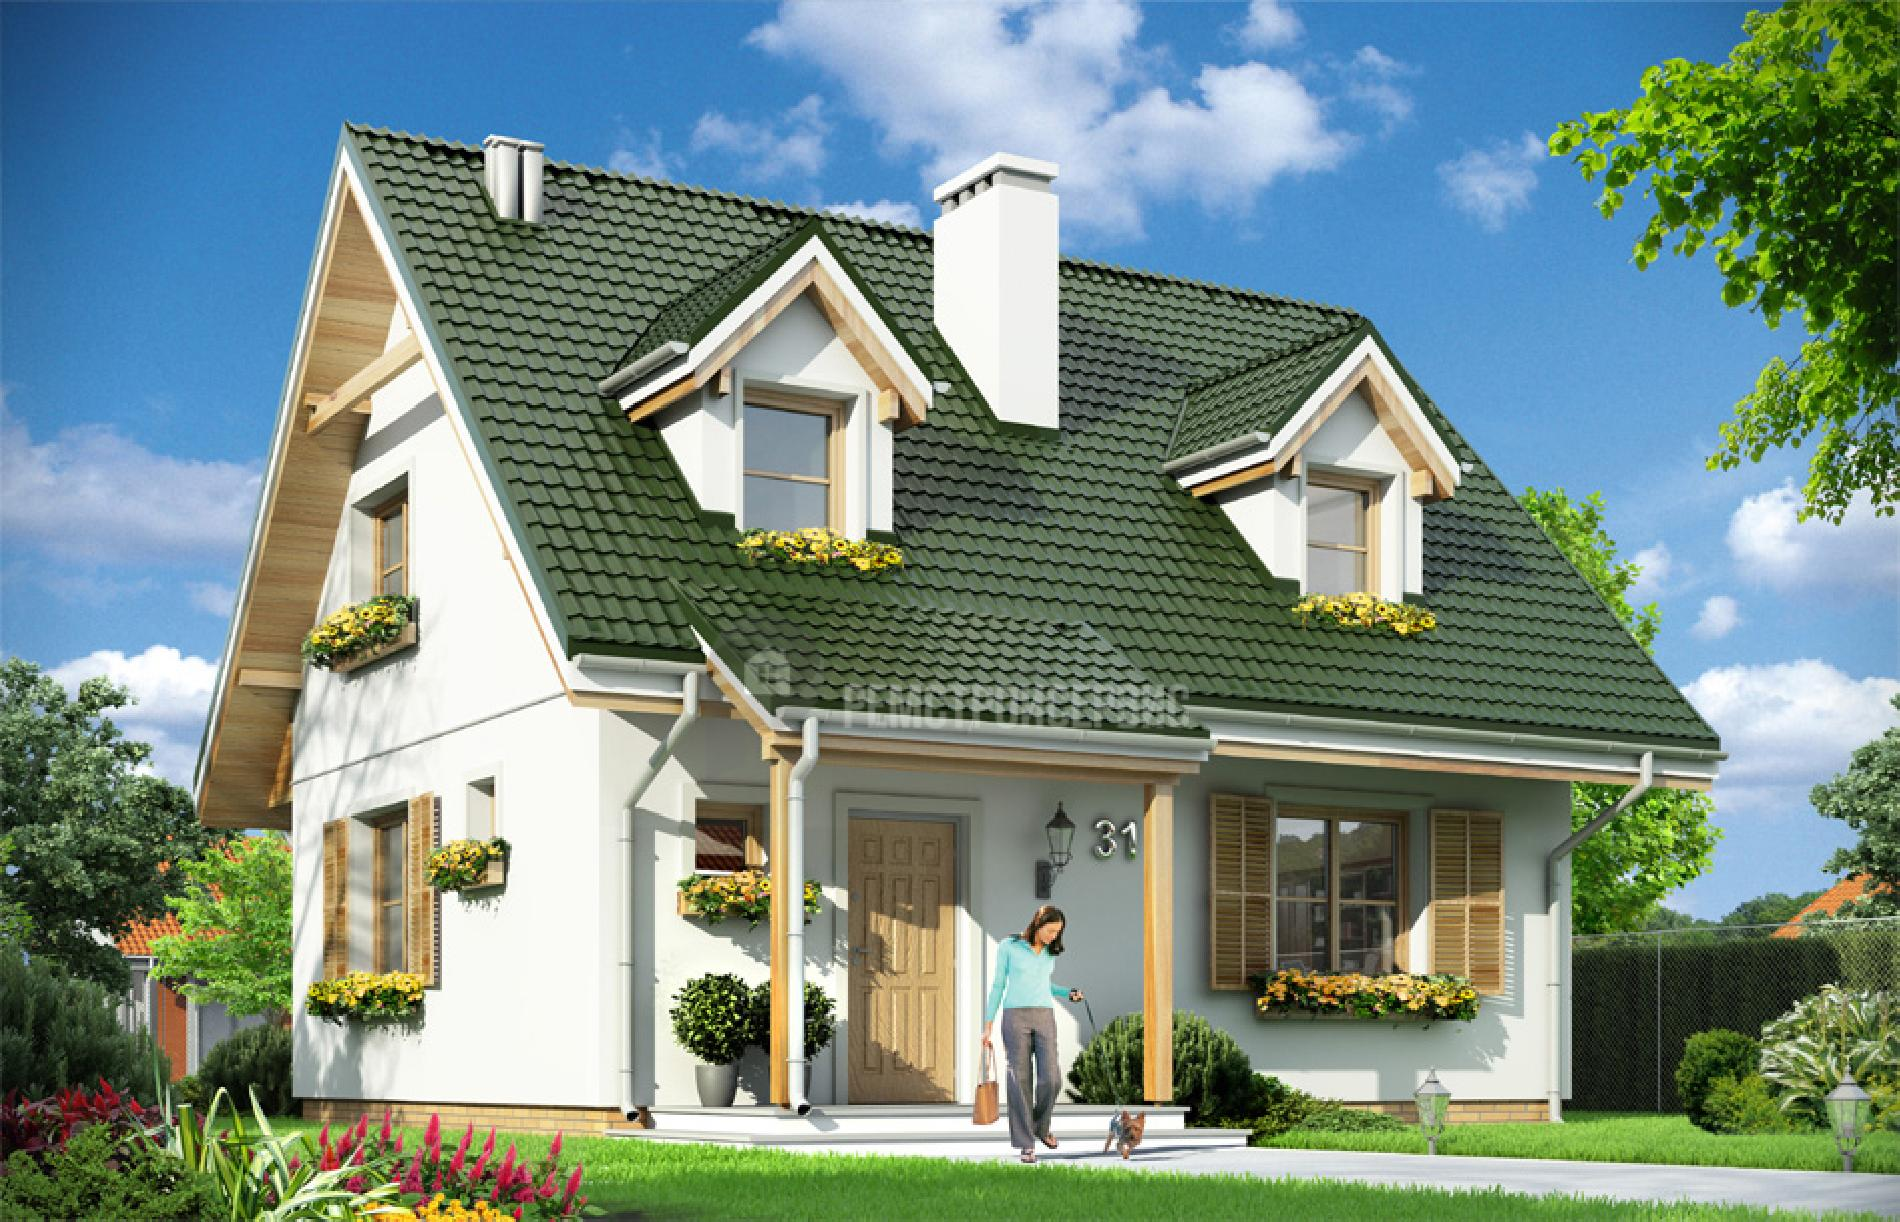 Casa cu fatada alba si acoperis verde